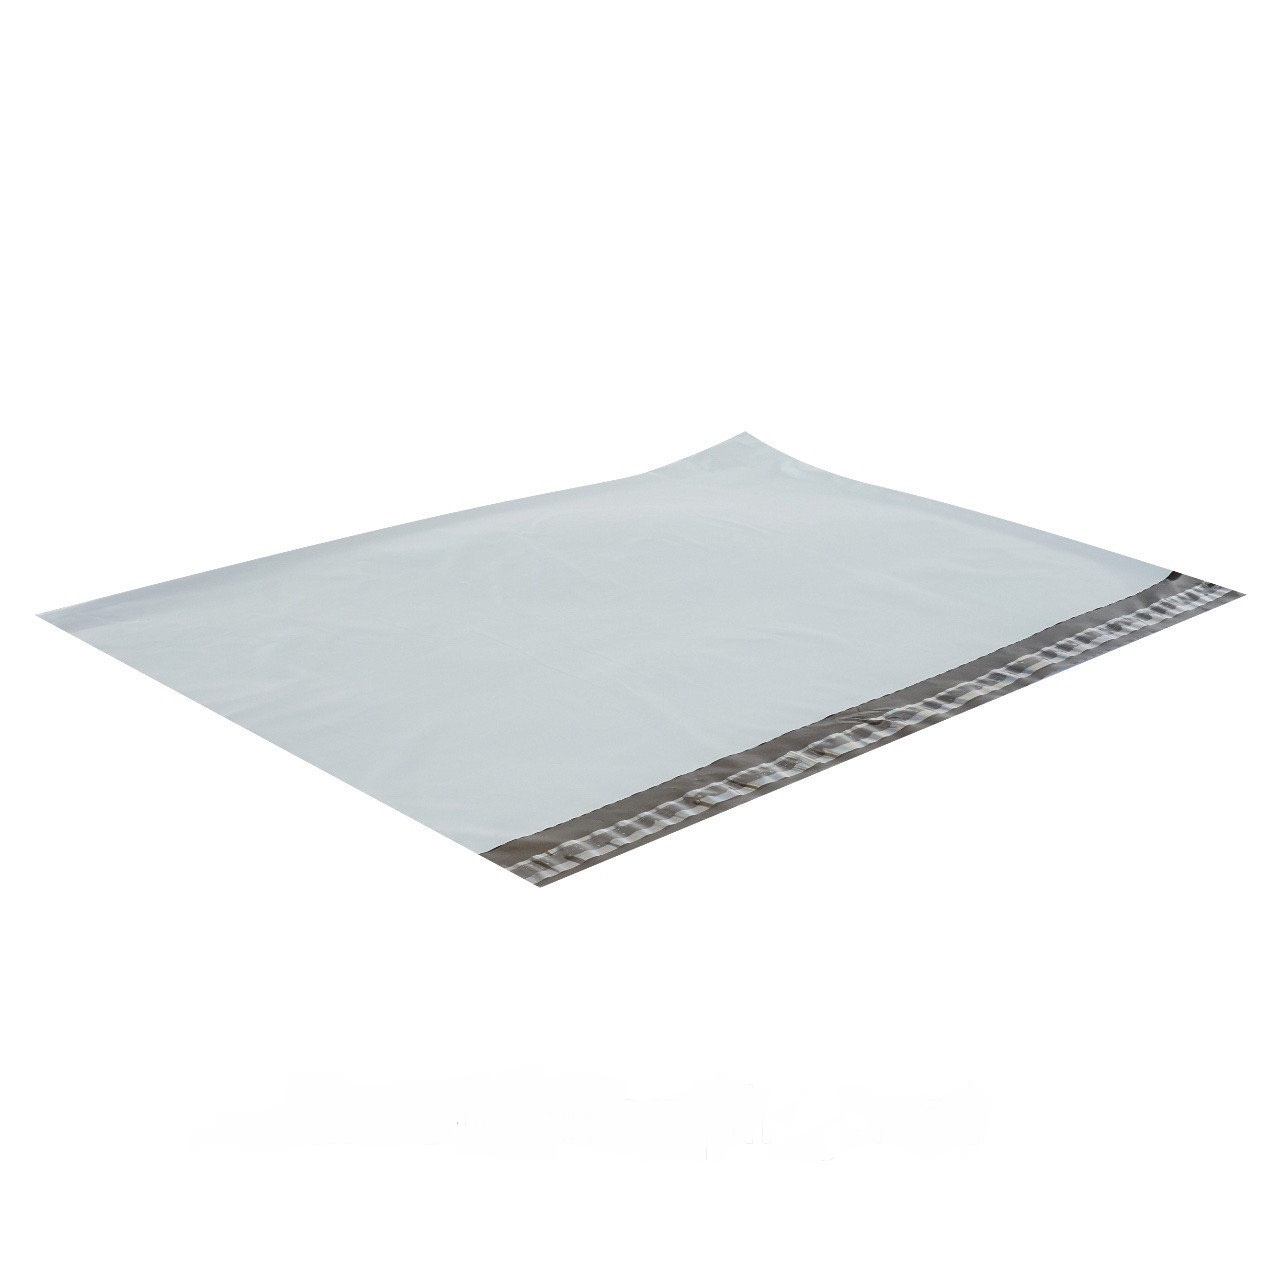 Курьерский пакет 300x400 мм, без логотипа с карманом 10 шт Курьерские пакеты изготовлены из...